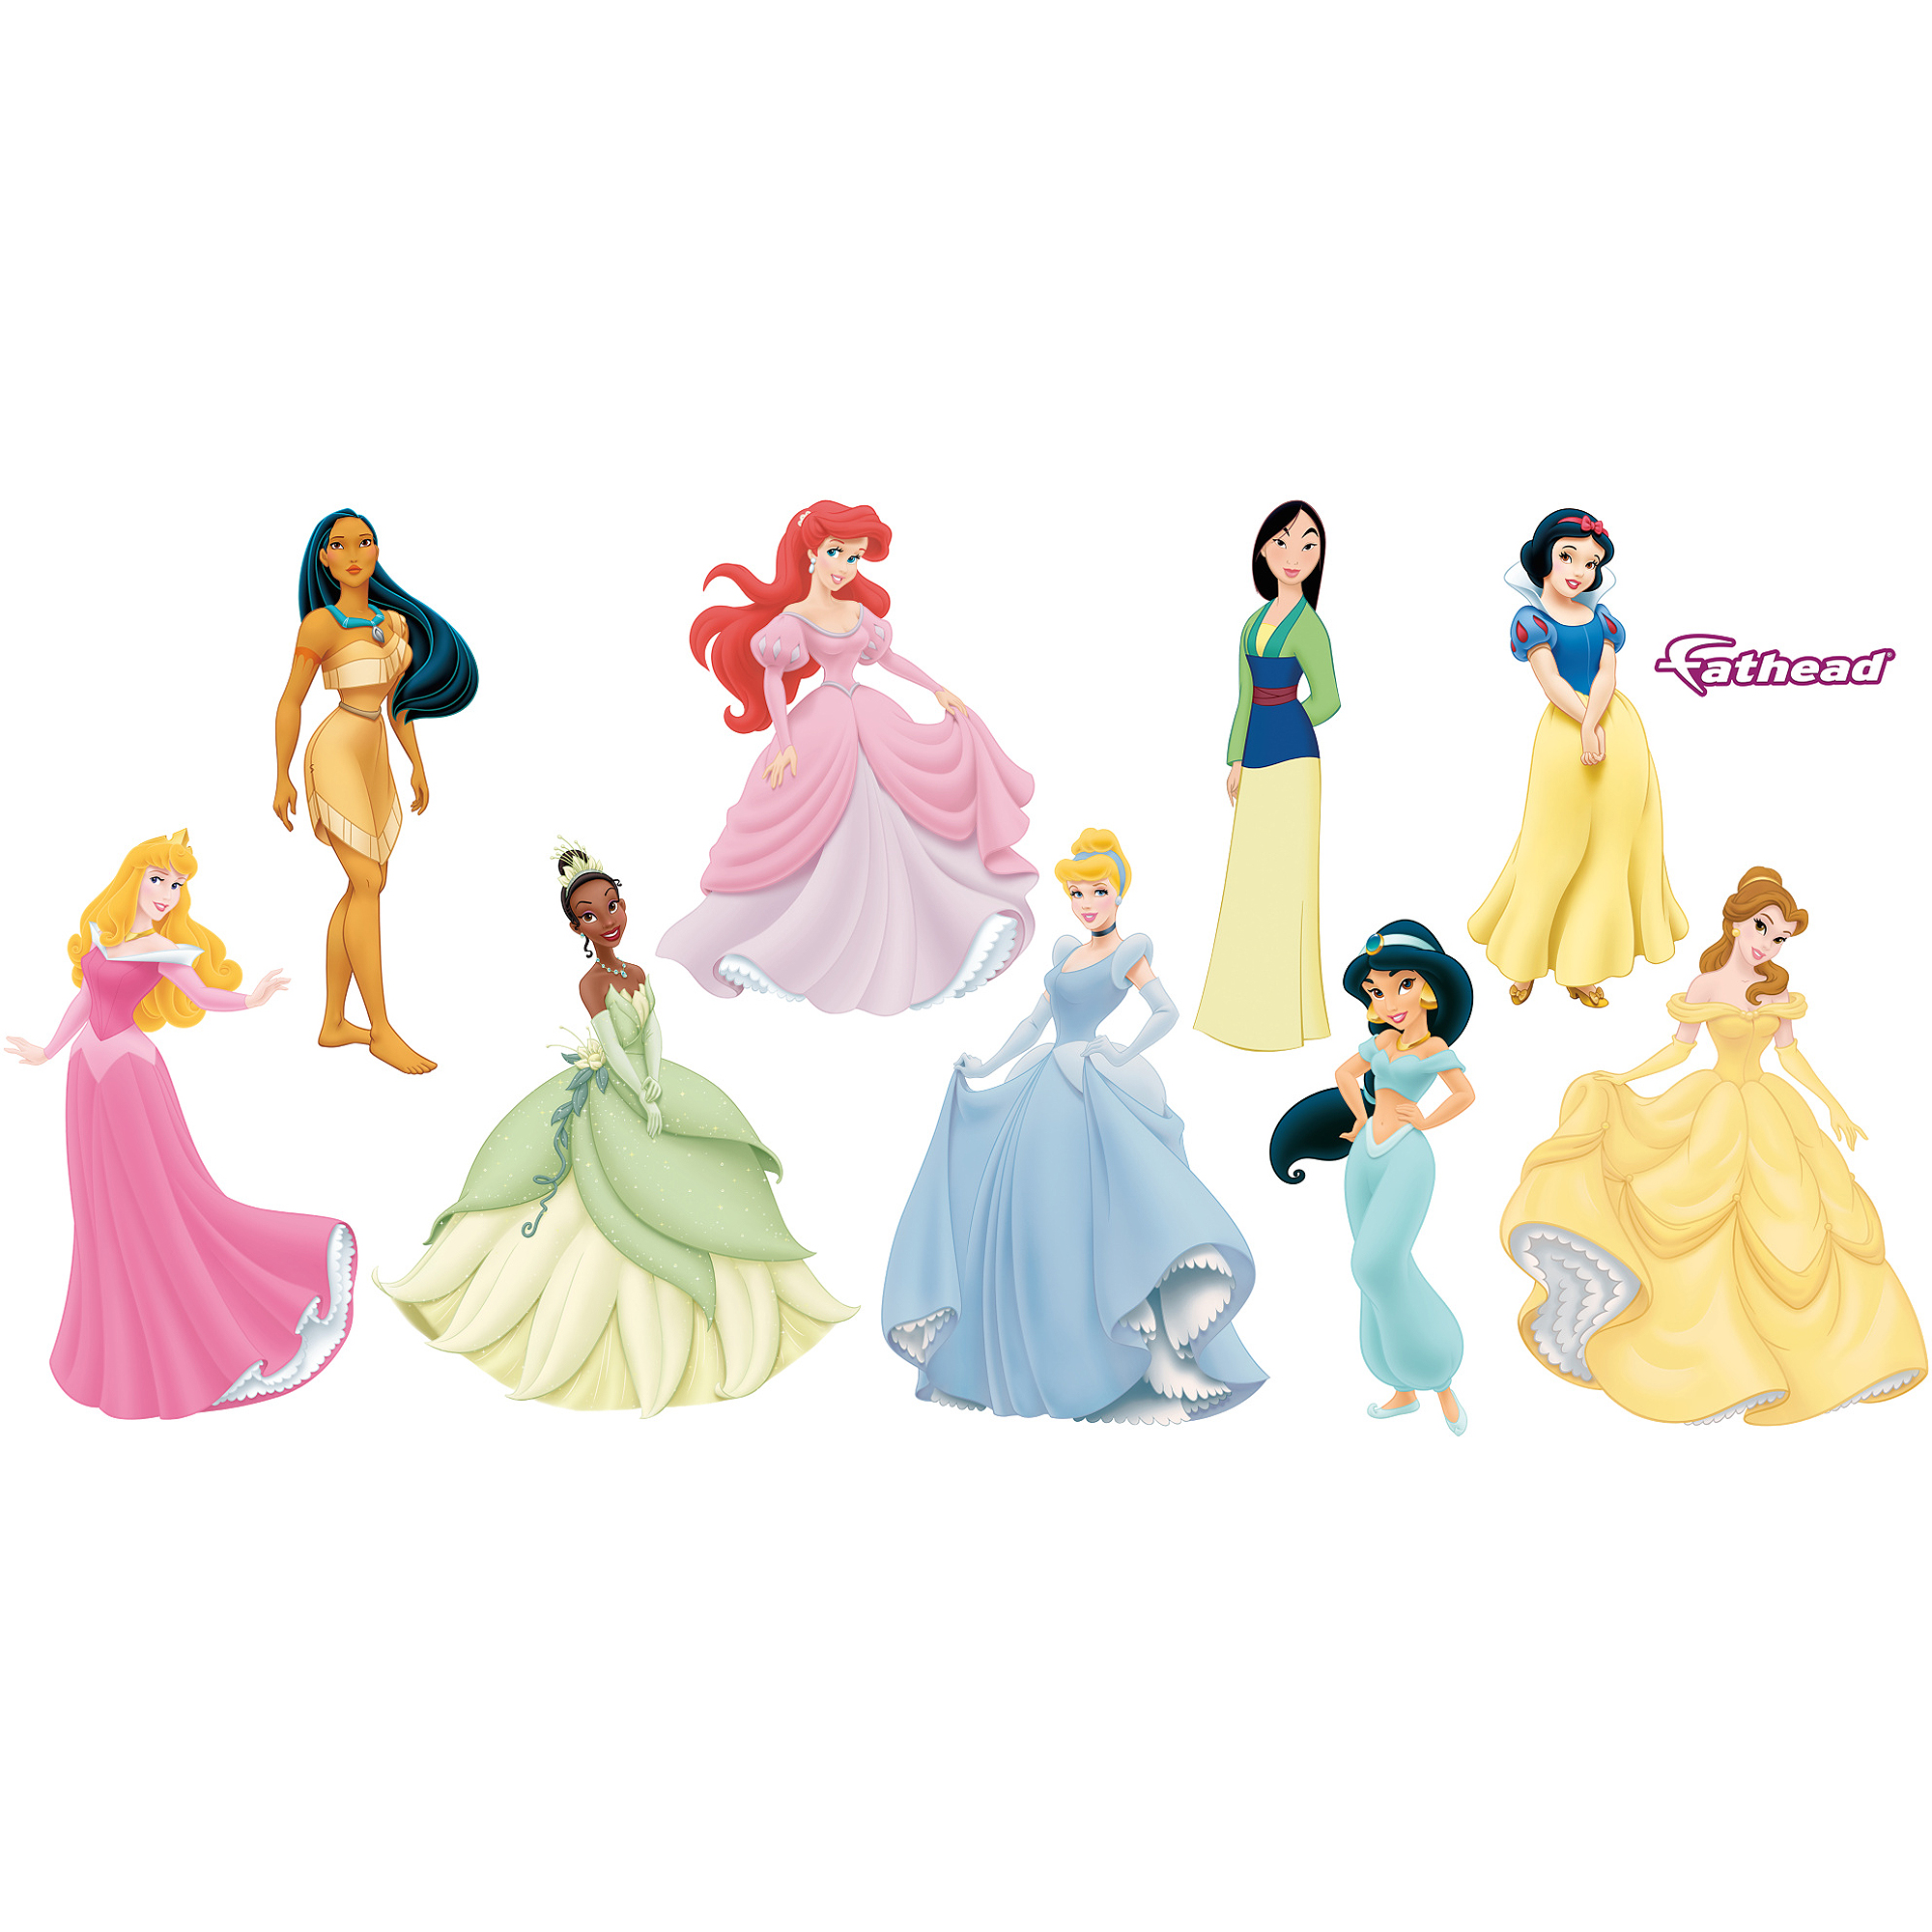 Fathead Disney Princess